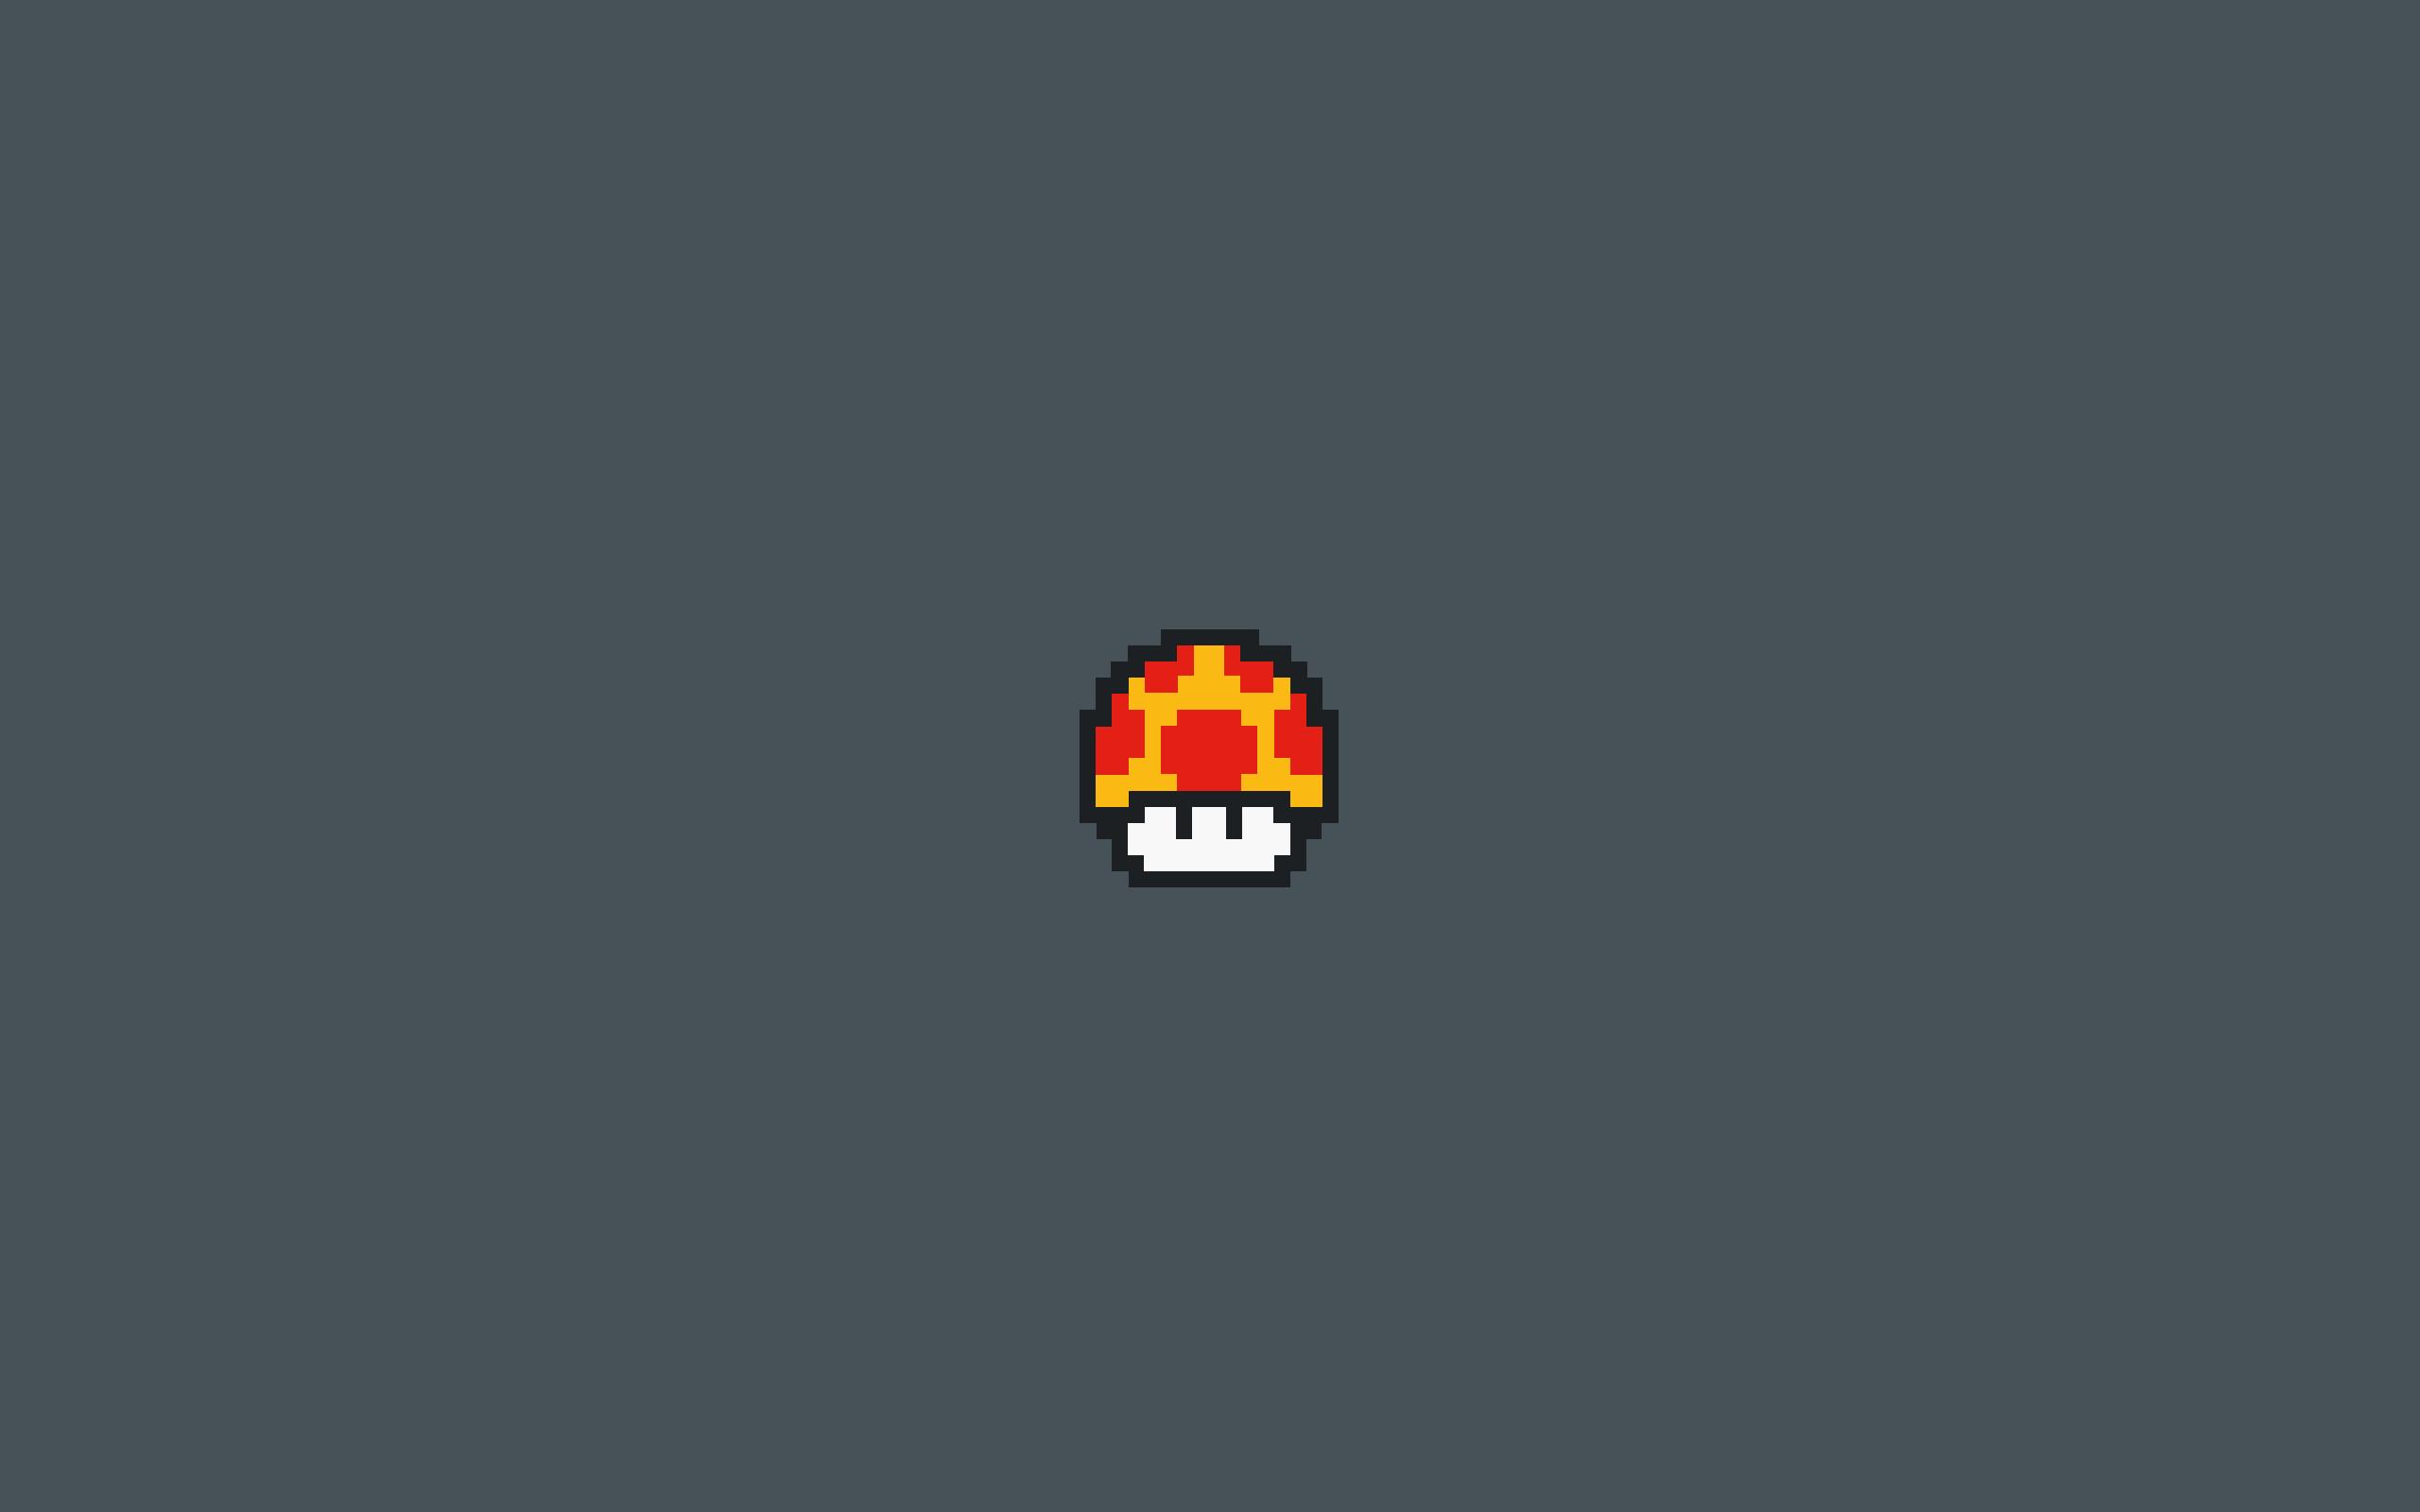 8-Bit Mushroom Desktop Background from Mario. Tumblr WallpaperHd …